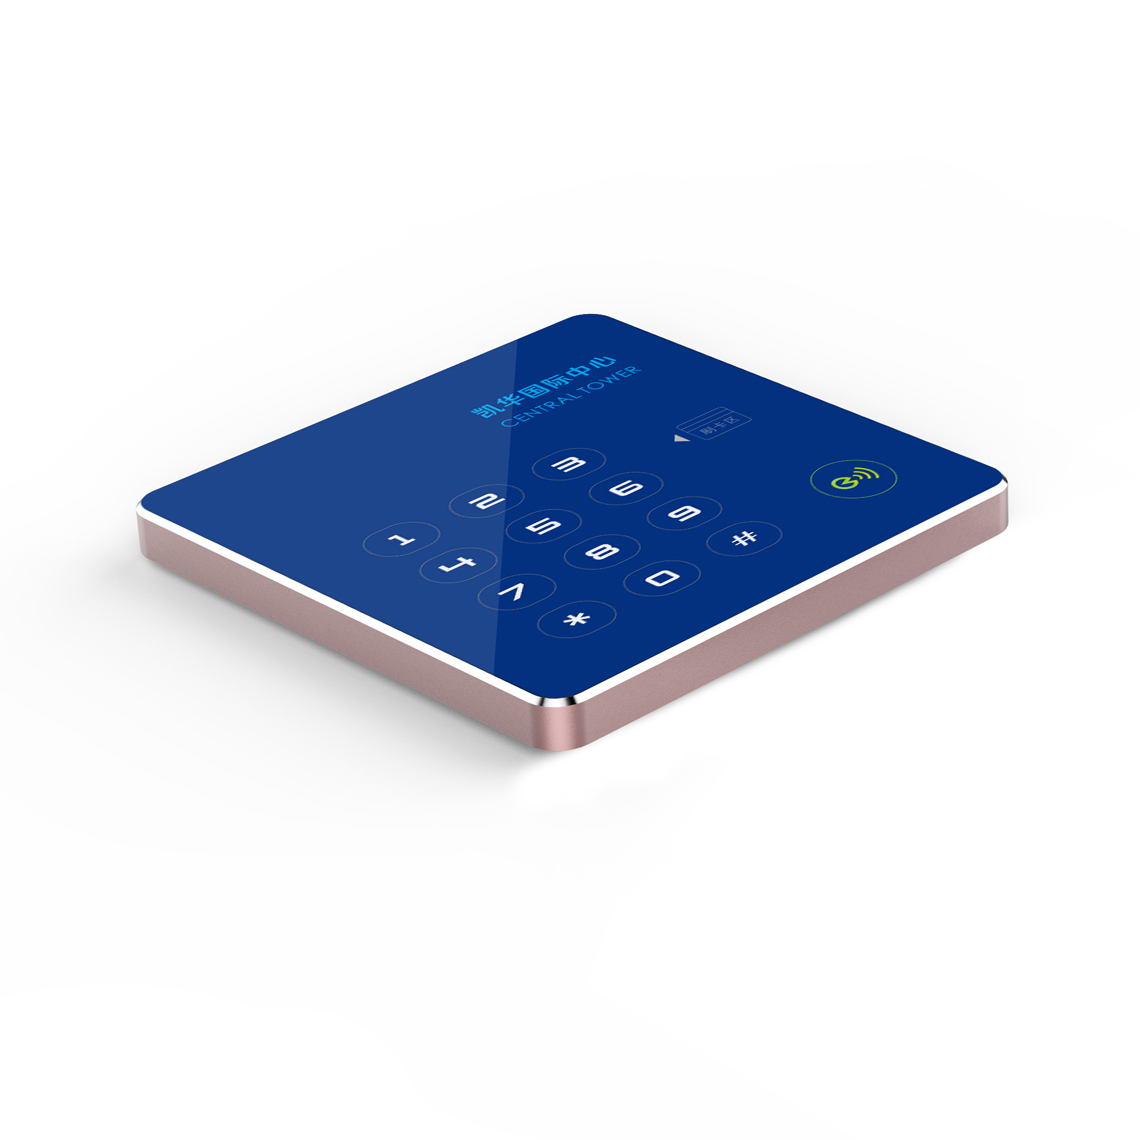 NFC 密码型—门禁读卡器